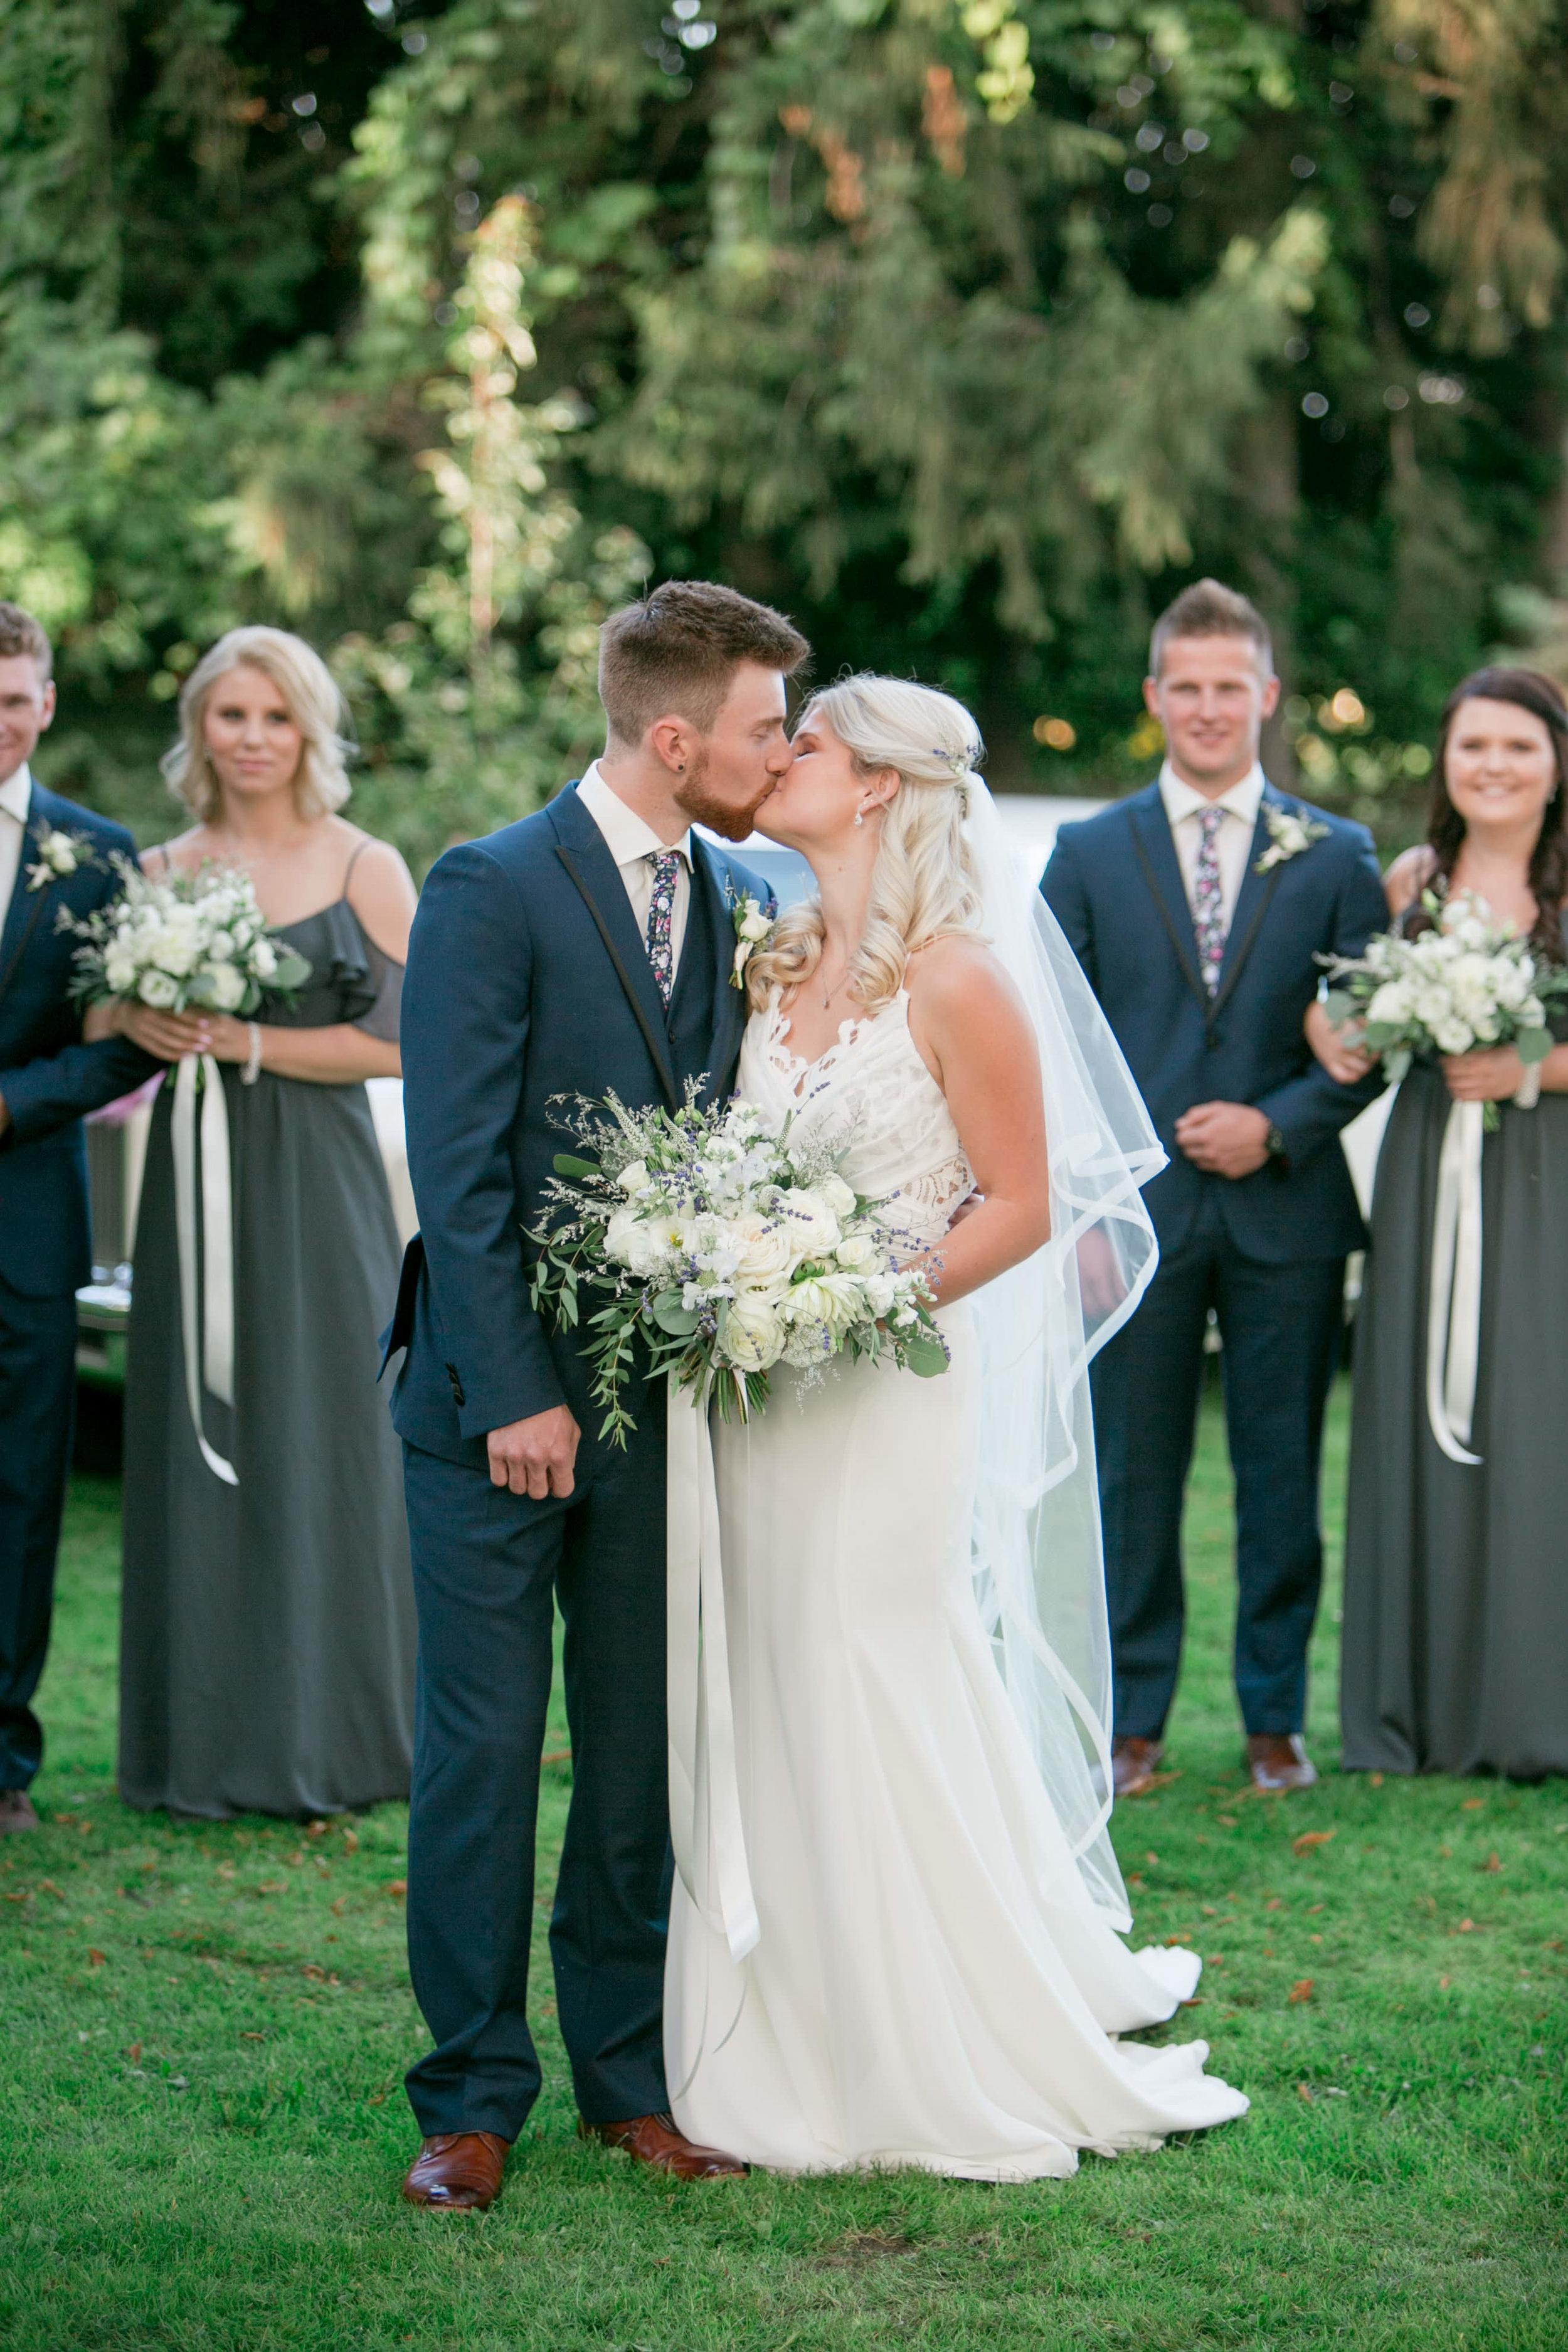 Maddy___Brandon___Daniel_Ricci_Weddings_High_Res._Finals_394.jpg